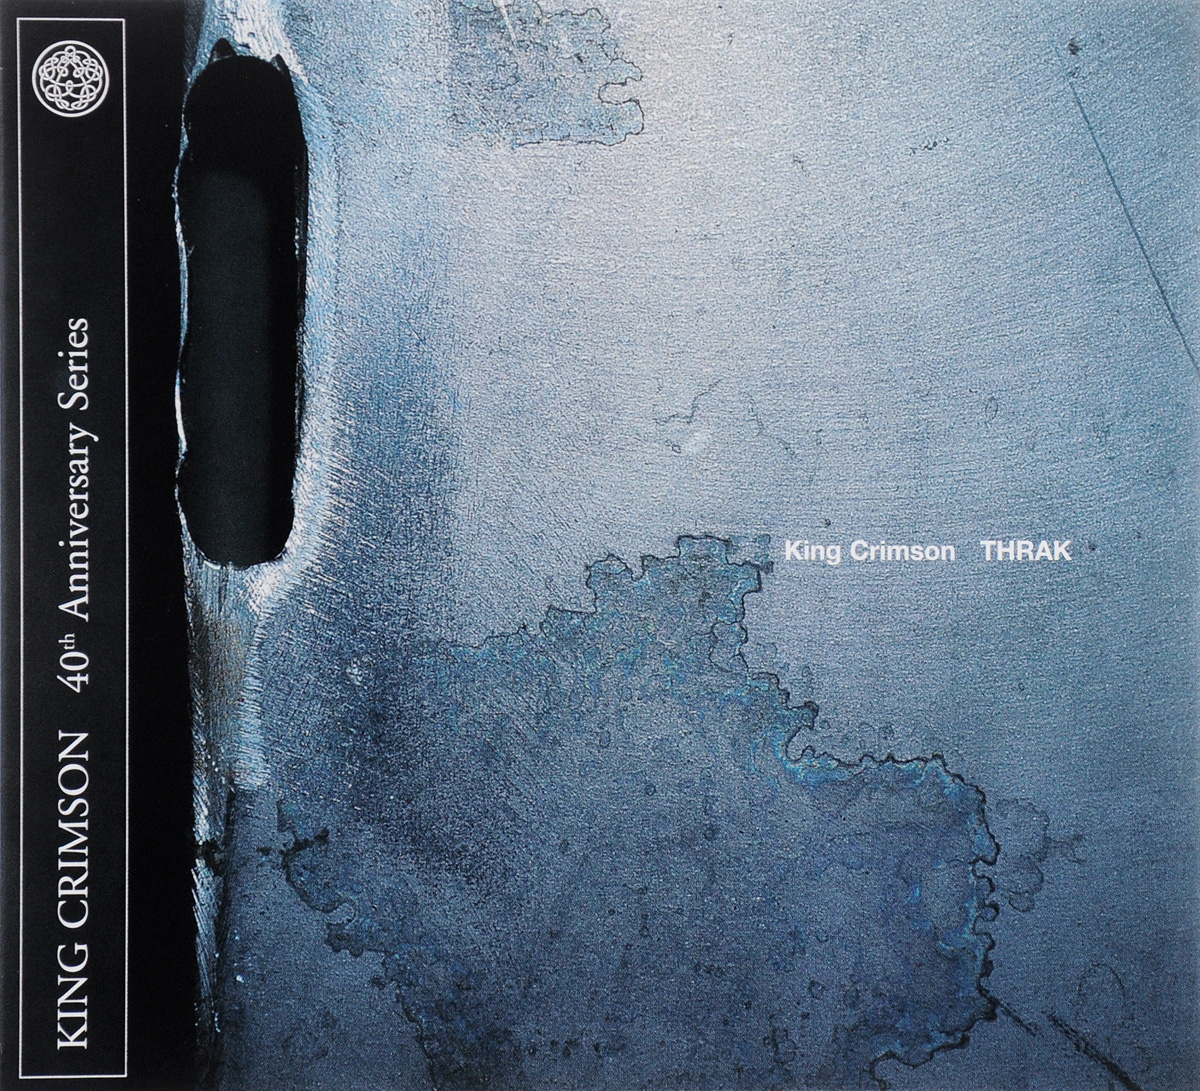 King Crimson King Crimson. Thrak 40th Anniversary Edition (CD + DVD) музыка dvd audio dts